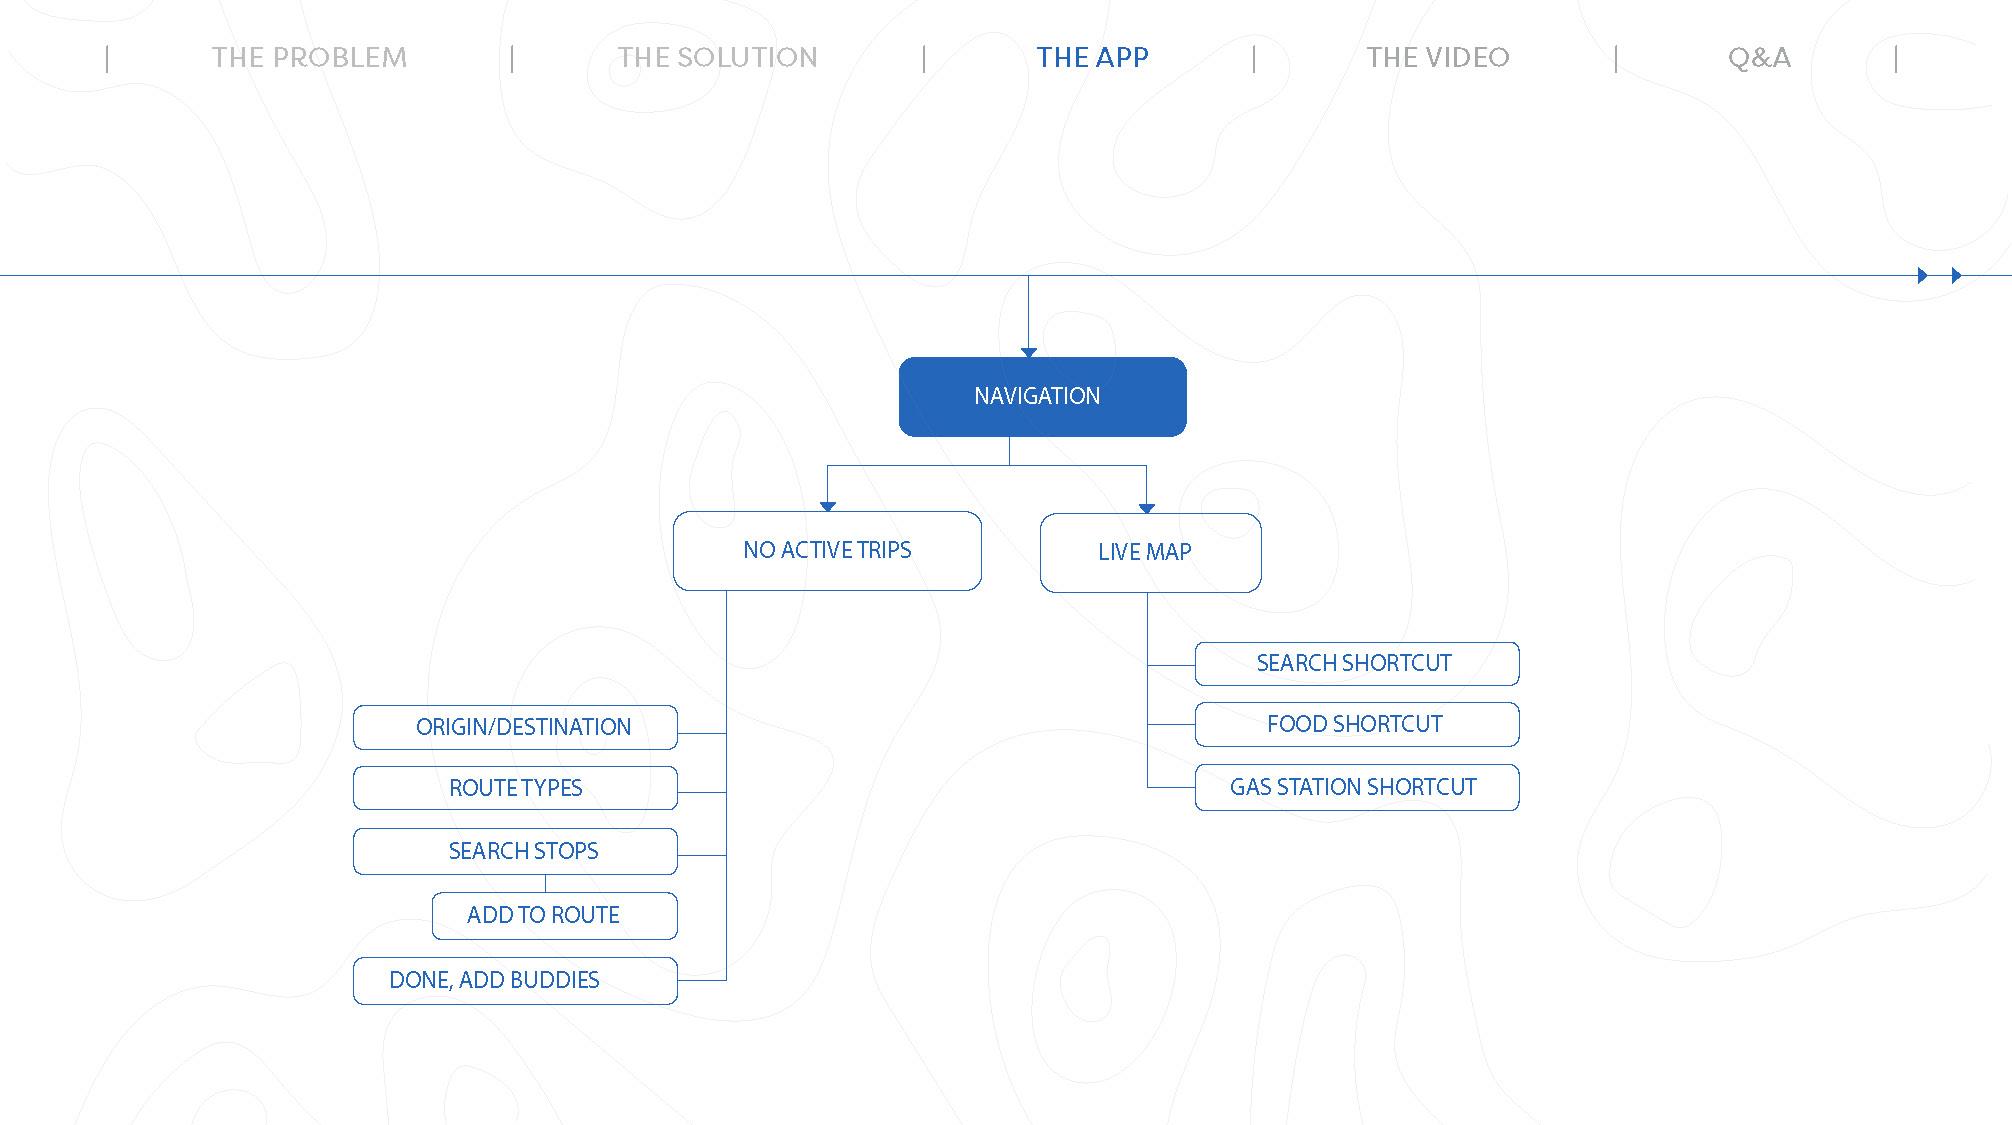 EXC3_Trippin_Presentation_FINAL_Page_24.jpg